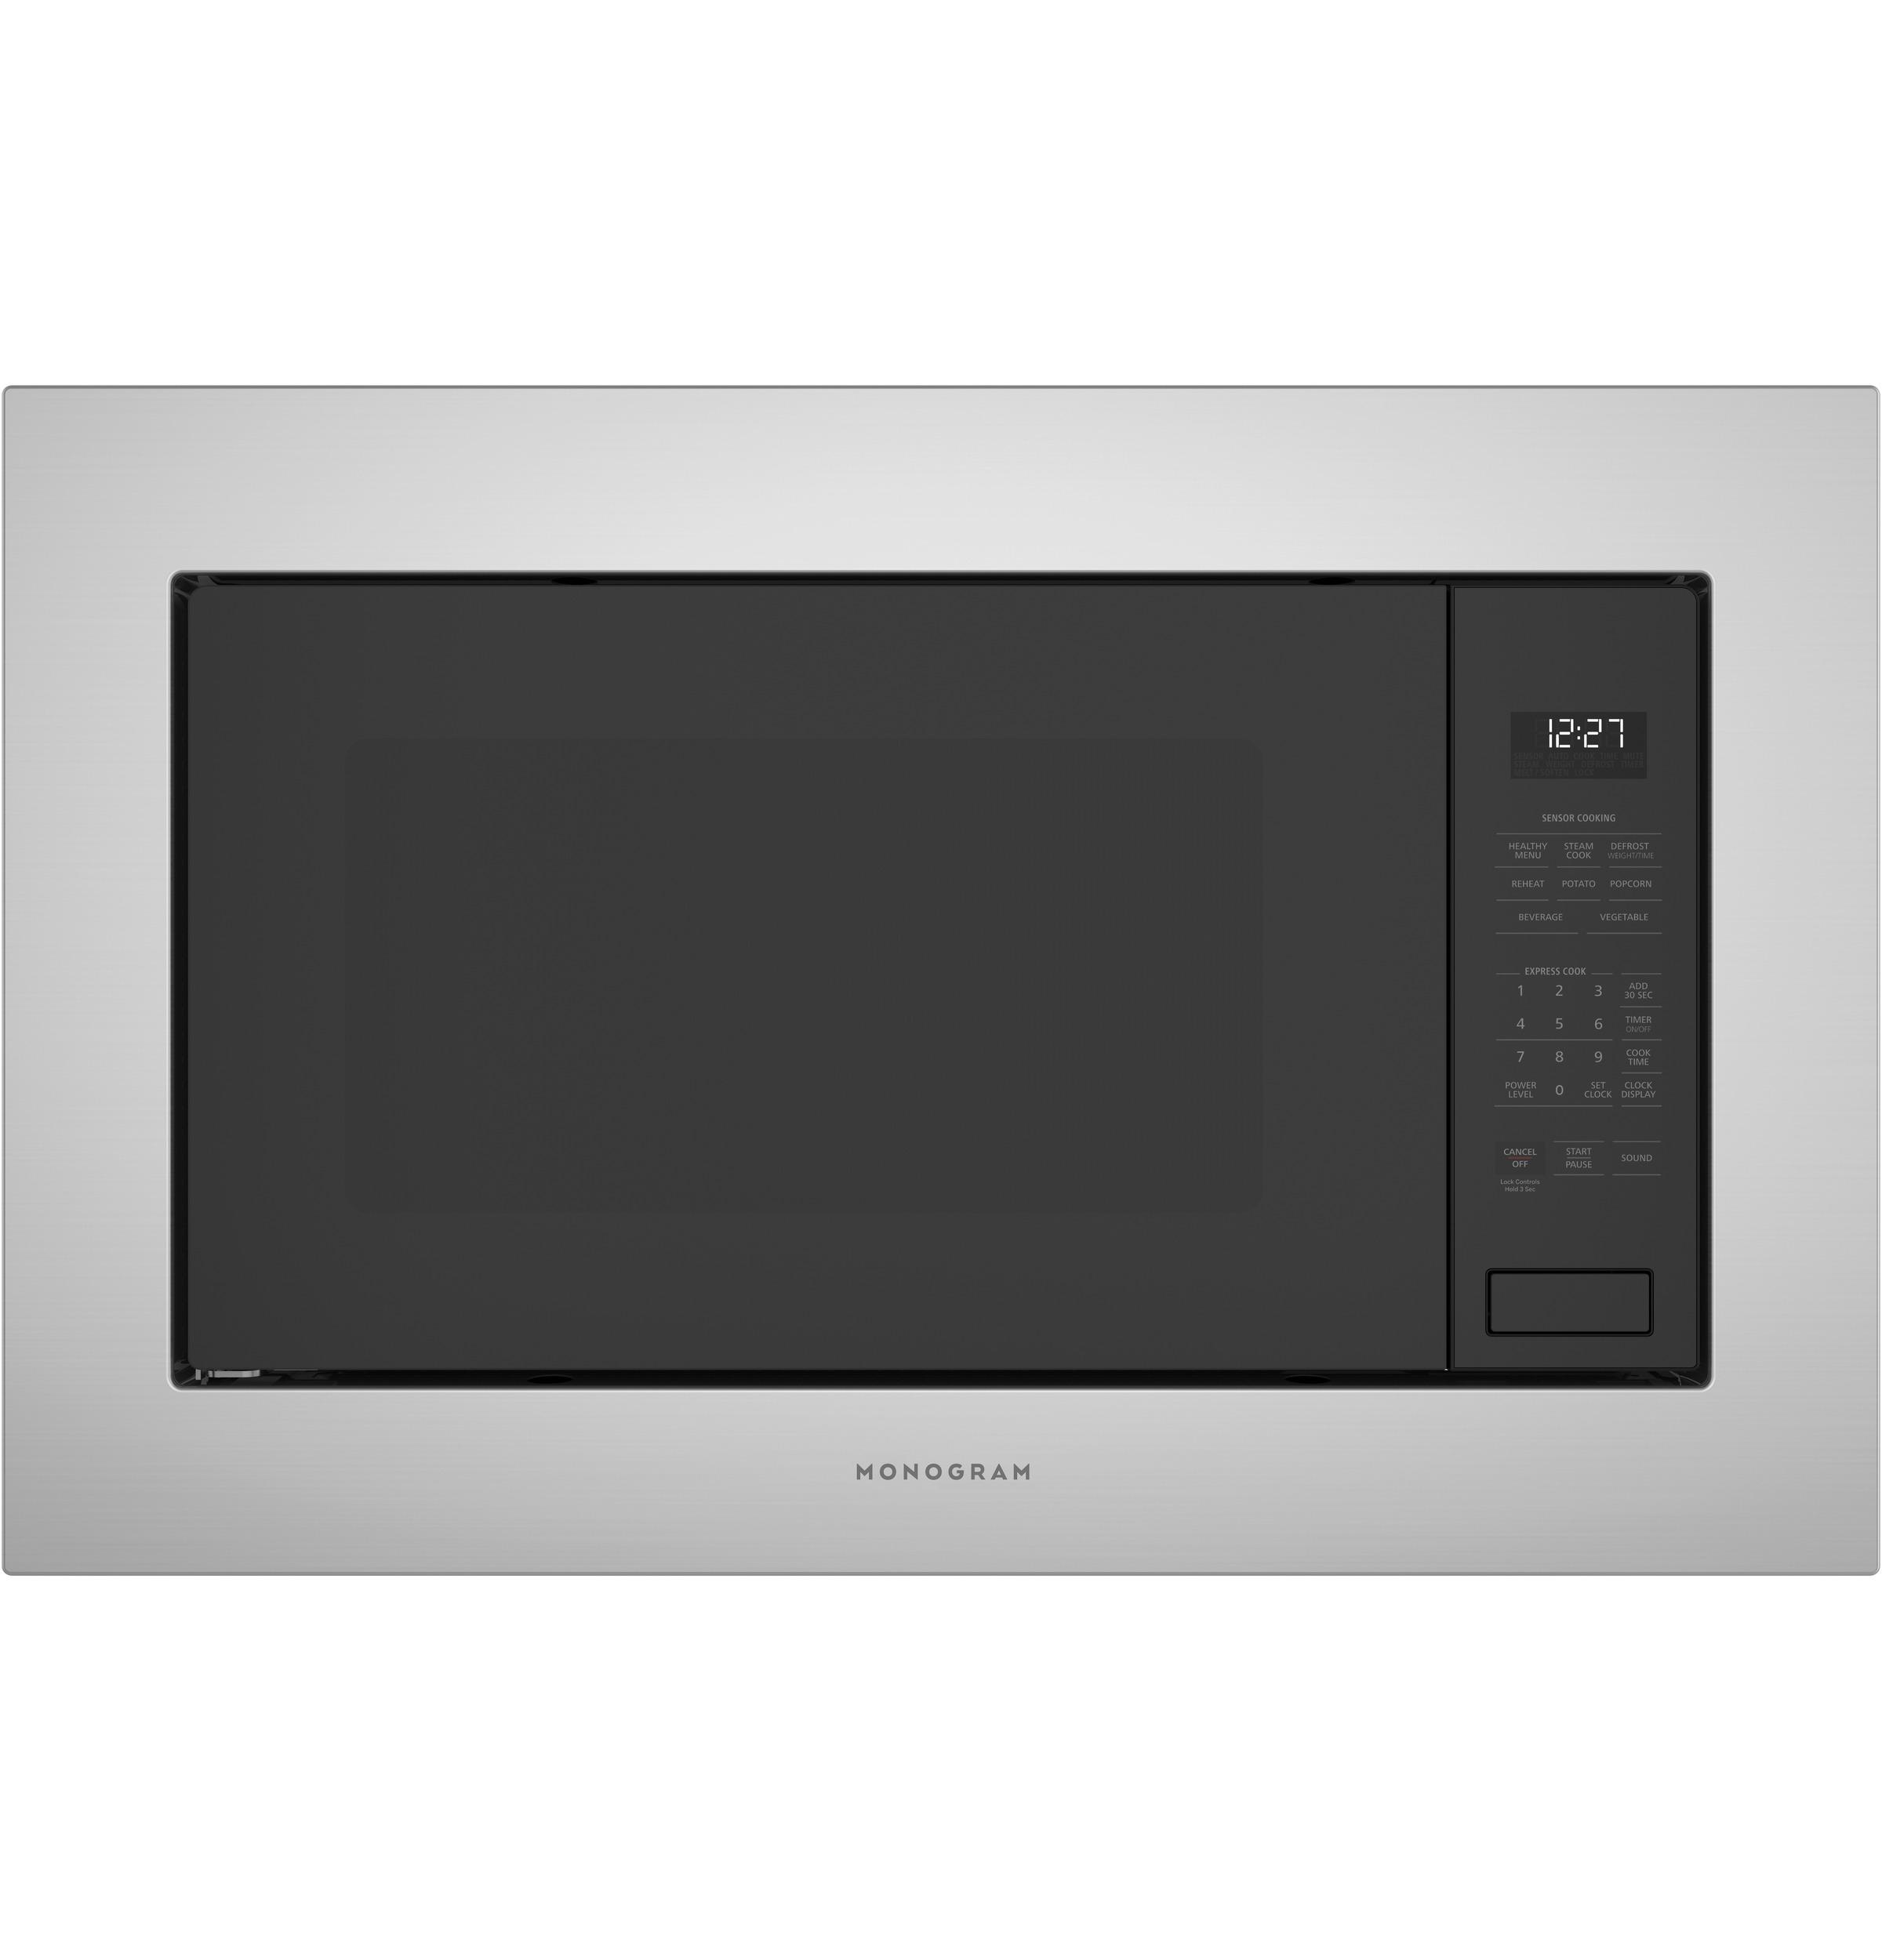 Monogram Monogram 2.2 Cu. Ft. Built-In Microwave Oven